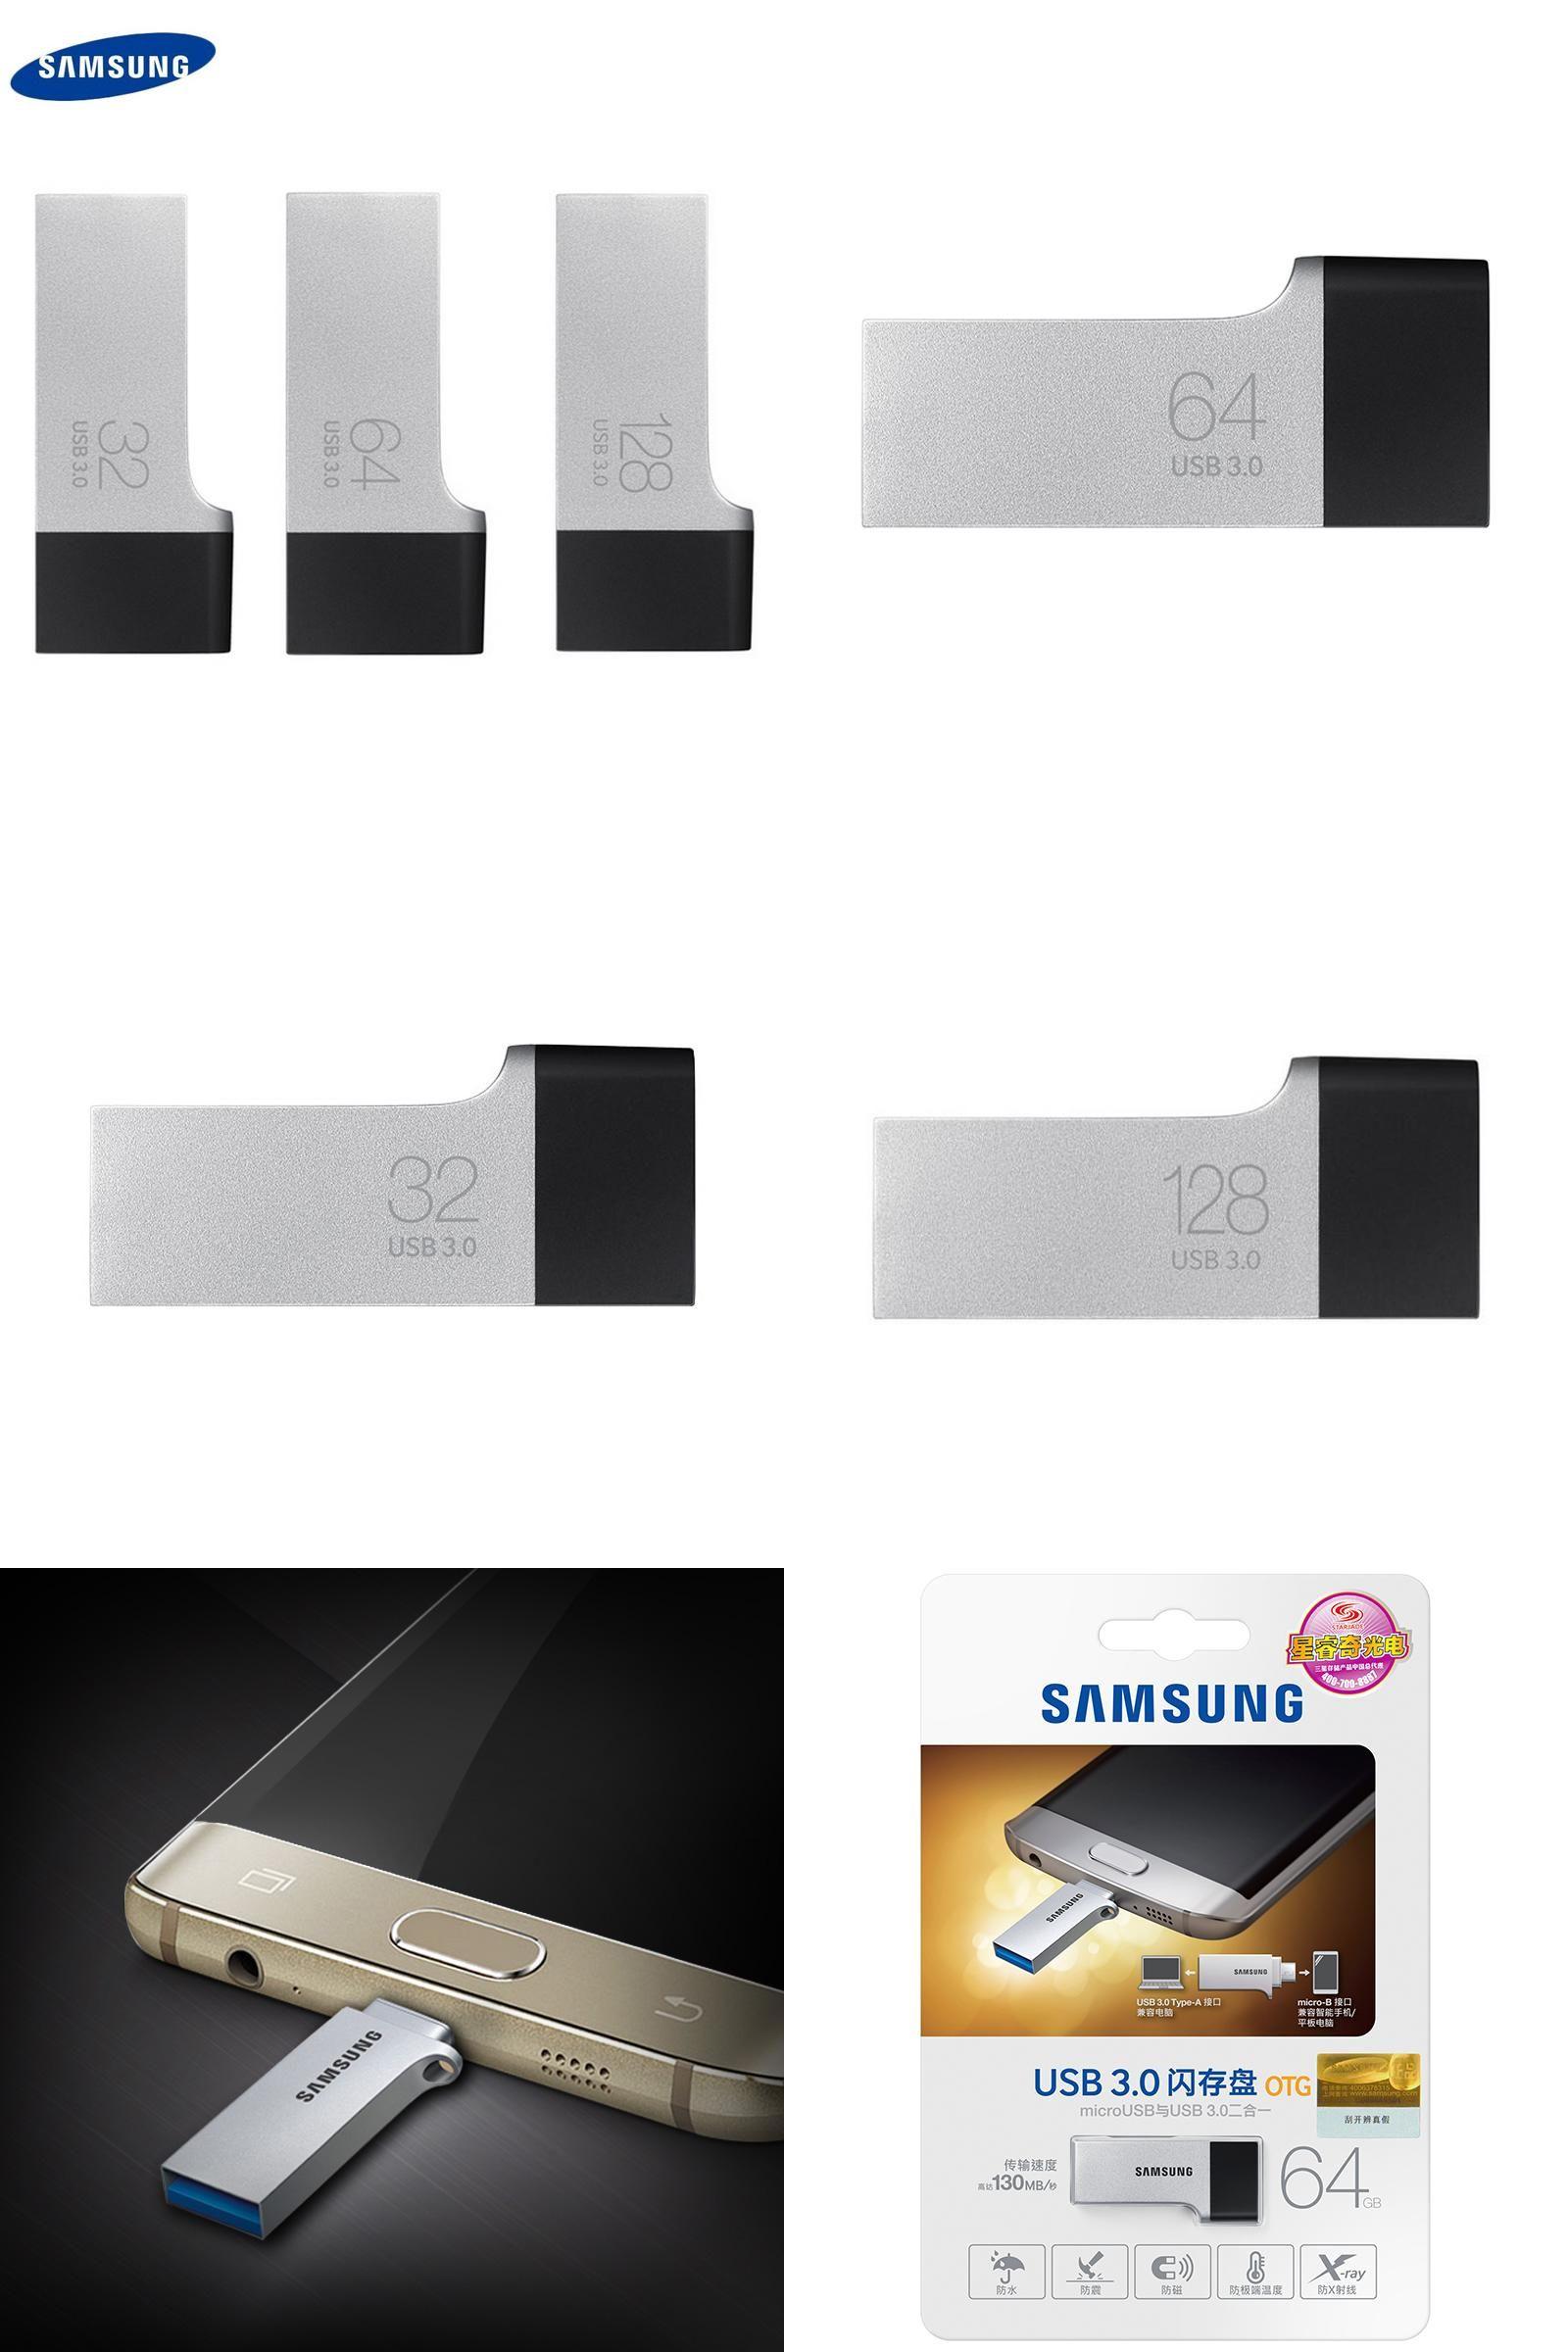 Visit To Buy Samsung Usb 30 Otg 128gb 64gb 32gb Smart Phone Tablet Flashdisk Pc